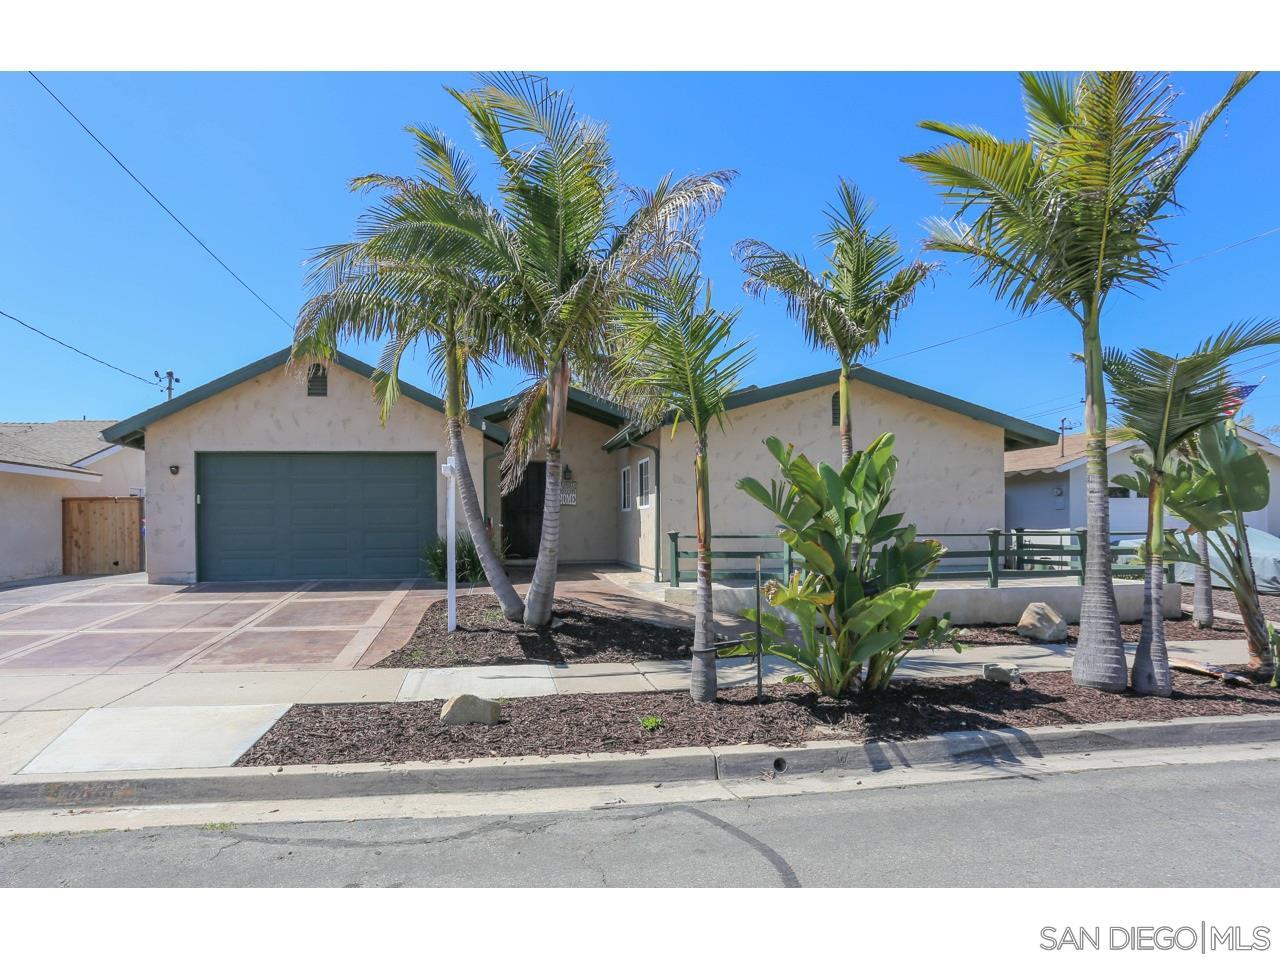 4641 Mount Laudo Dr, San Diego, CA 92117